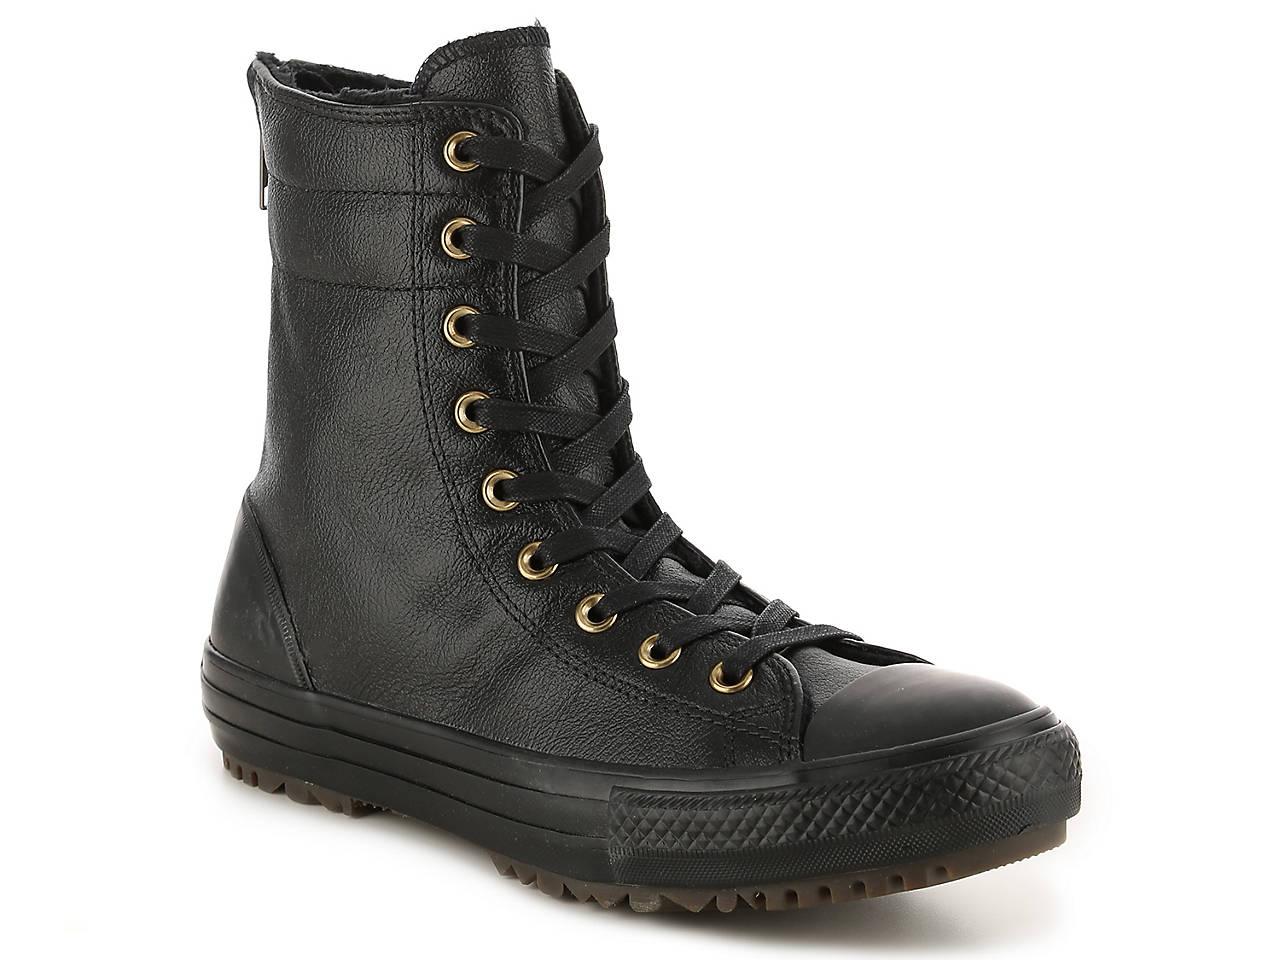 48bedfaaaeaa Converse Chuck Taylor All Star Hi-Rise High-Top Sneaker - Women s ...